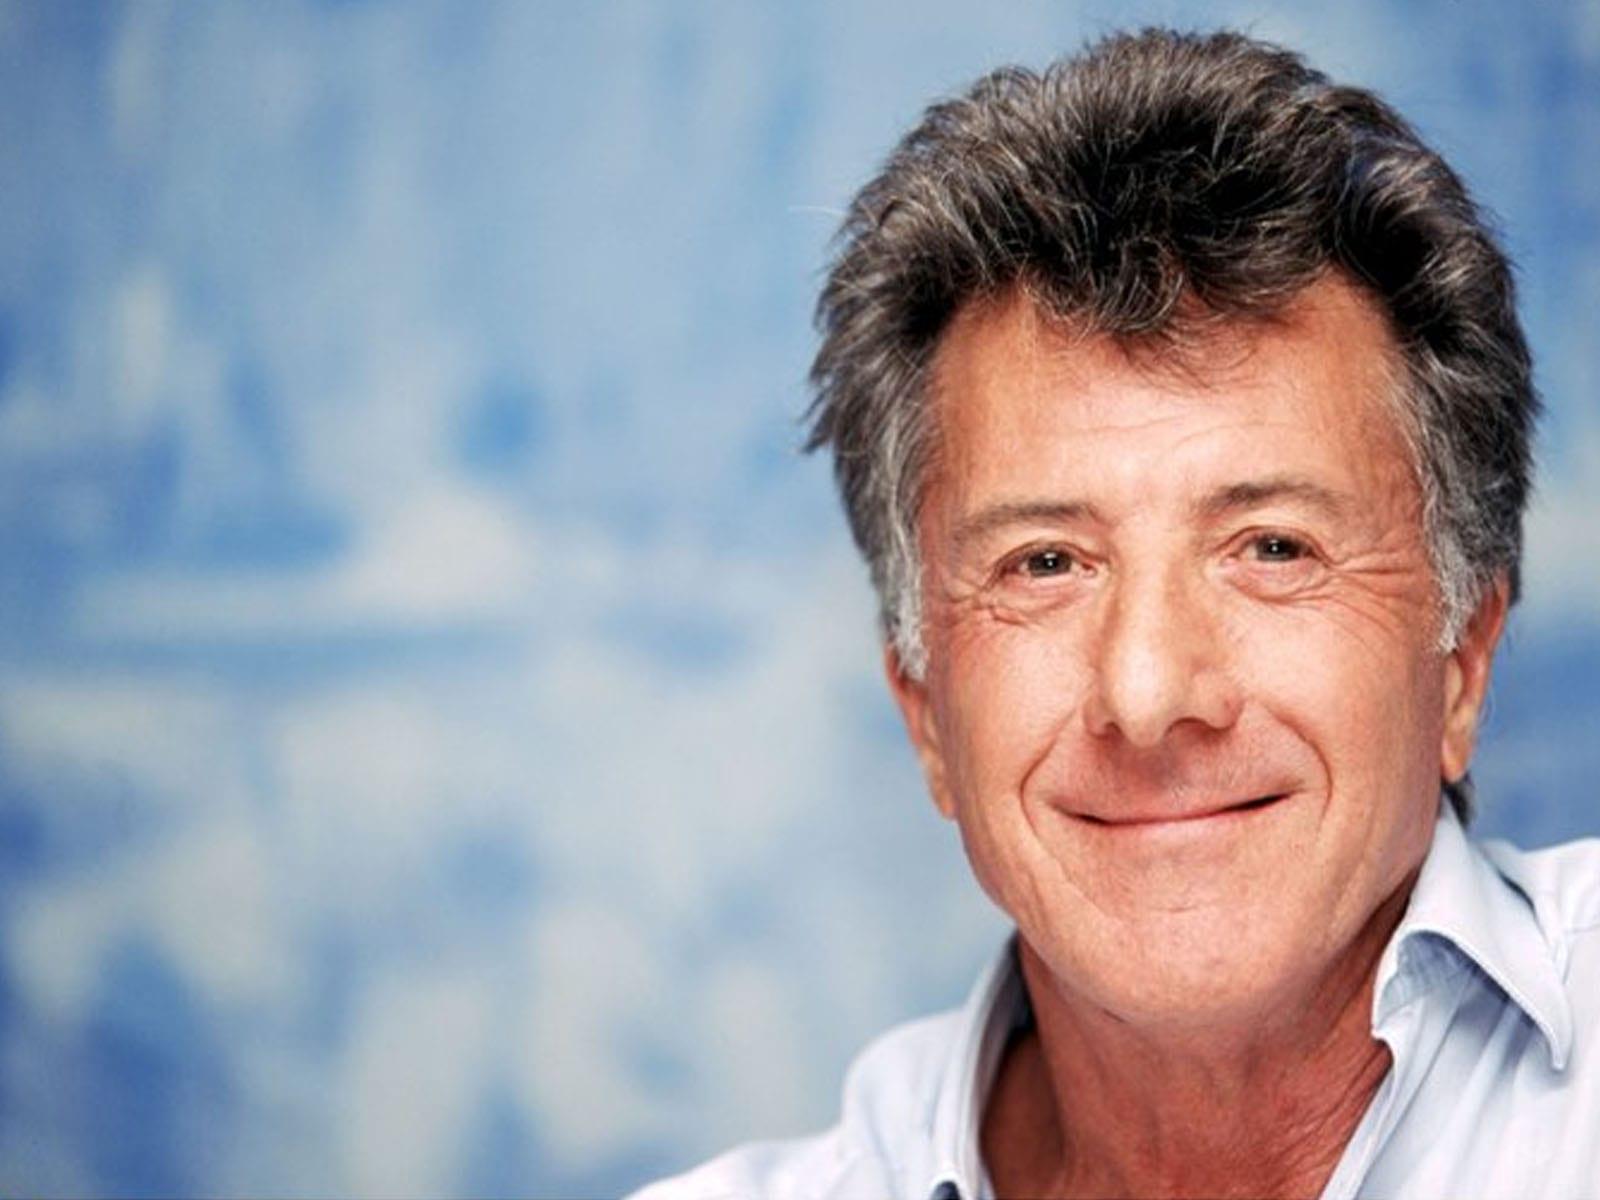 Dustin Hoffman Widescreen for desktop